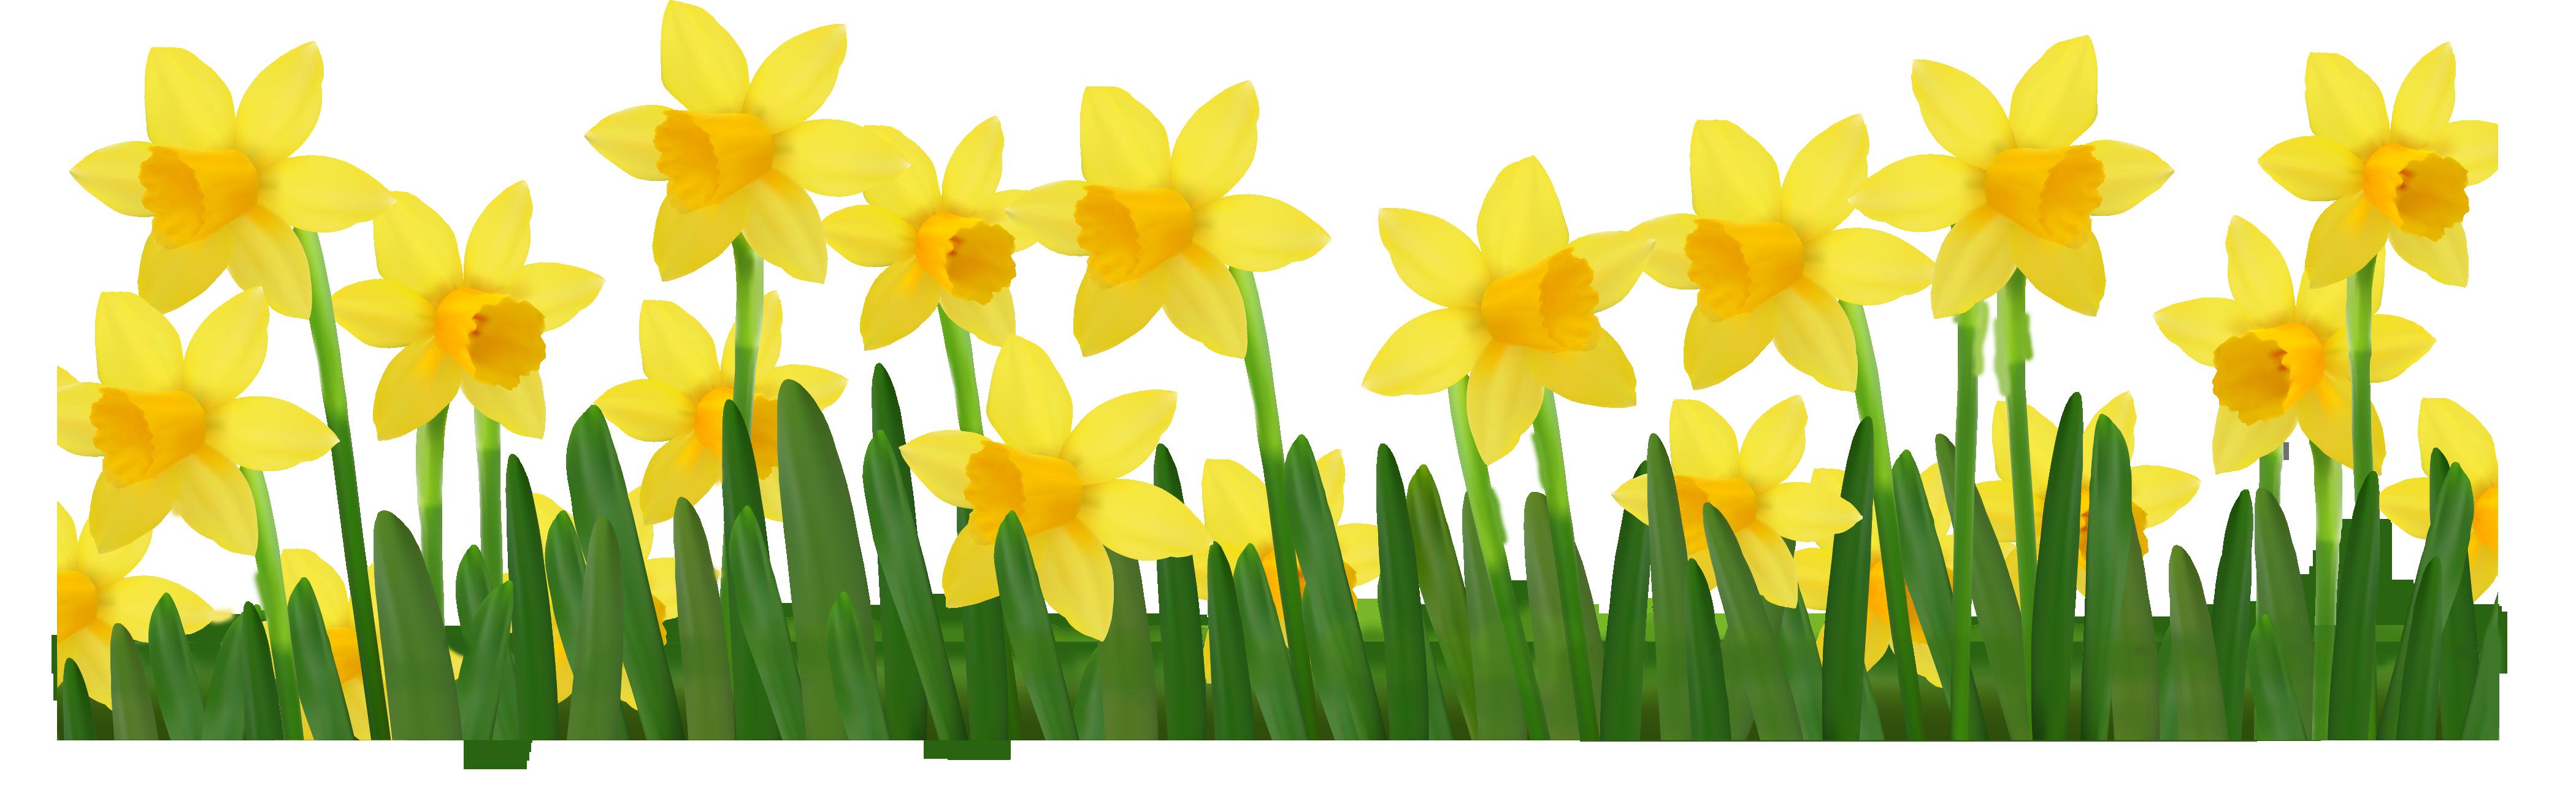 Free Daffodil Clip Art, Download Free Clip Art, Free Clip.